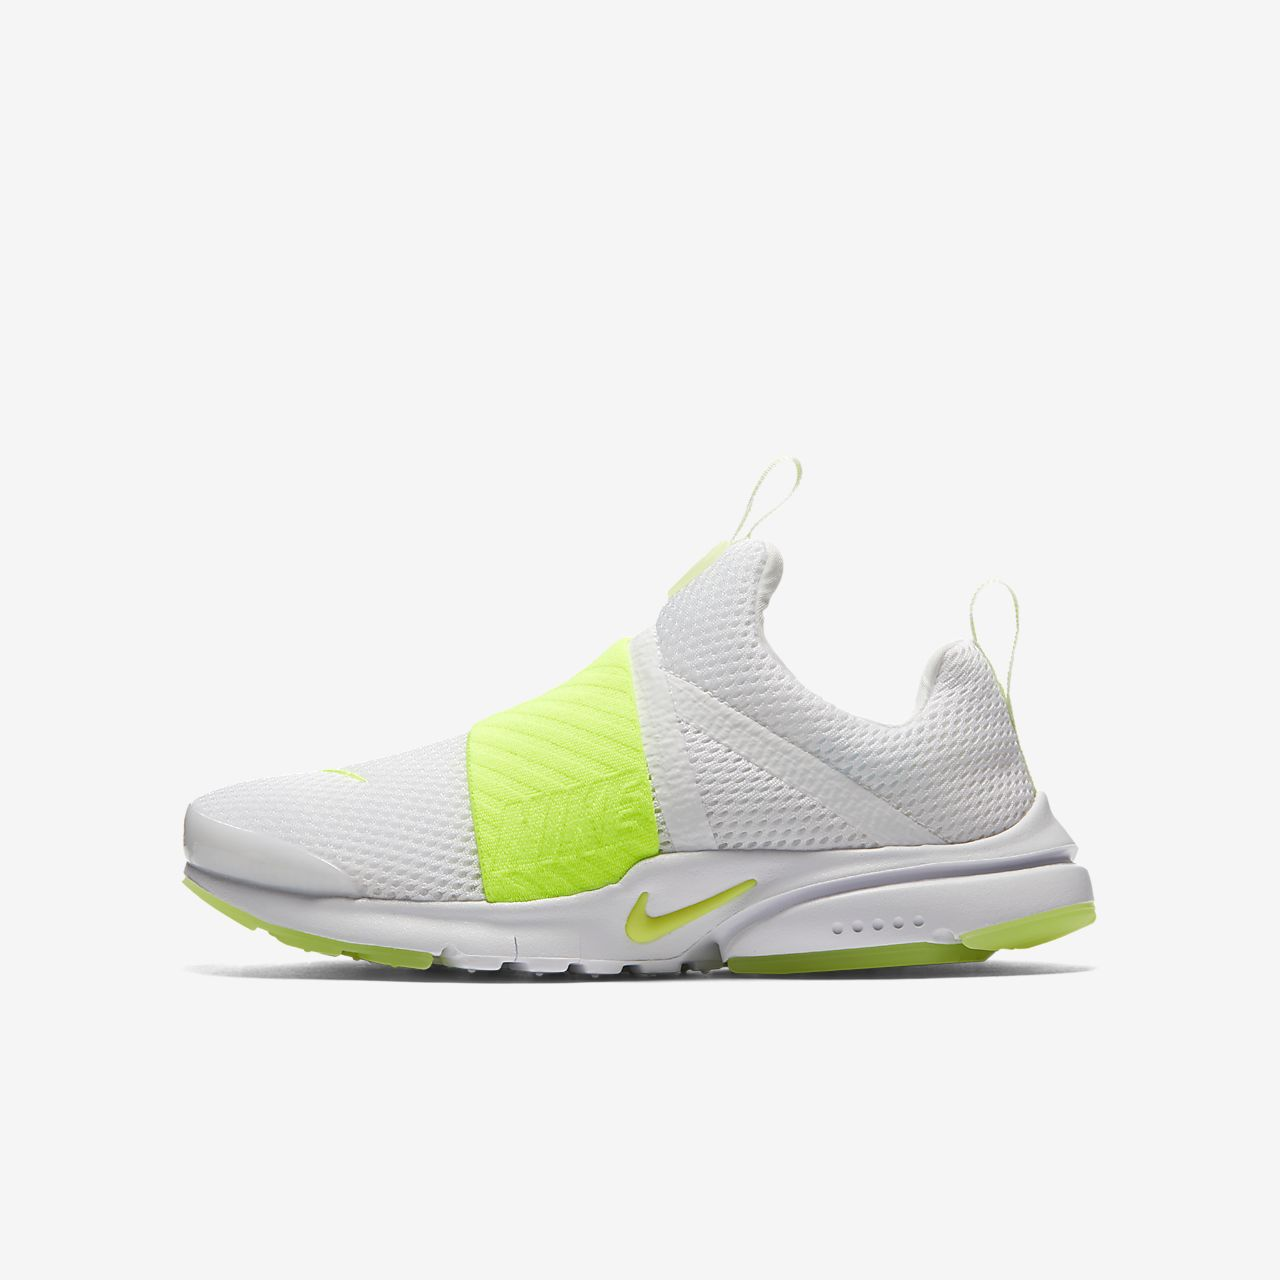 Nike Presto Extreme SE Big Kids' Shoe